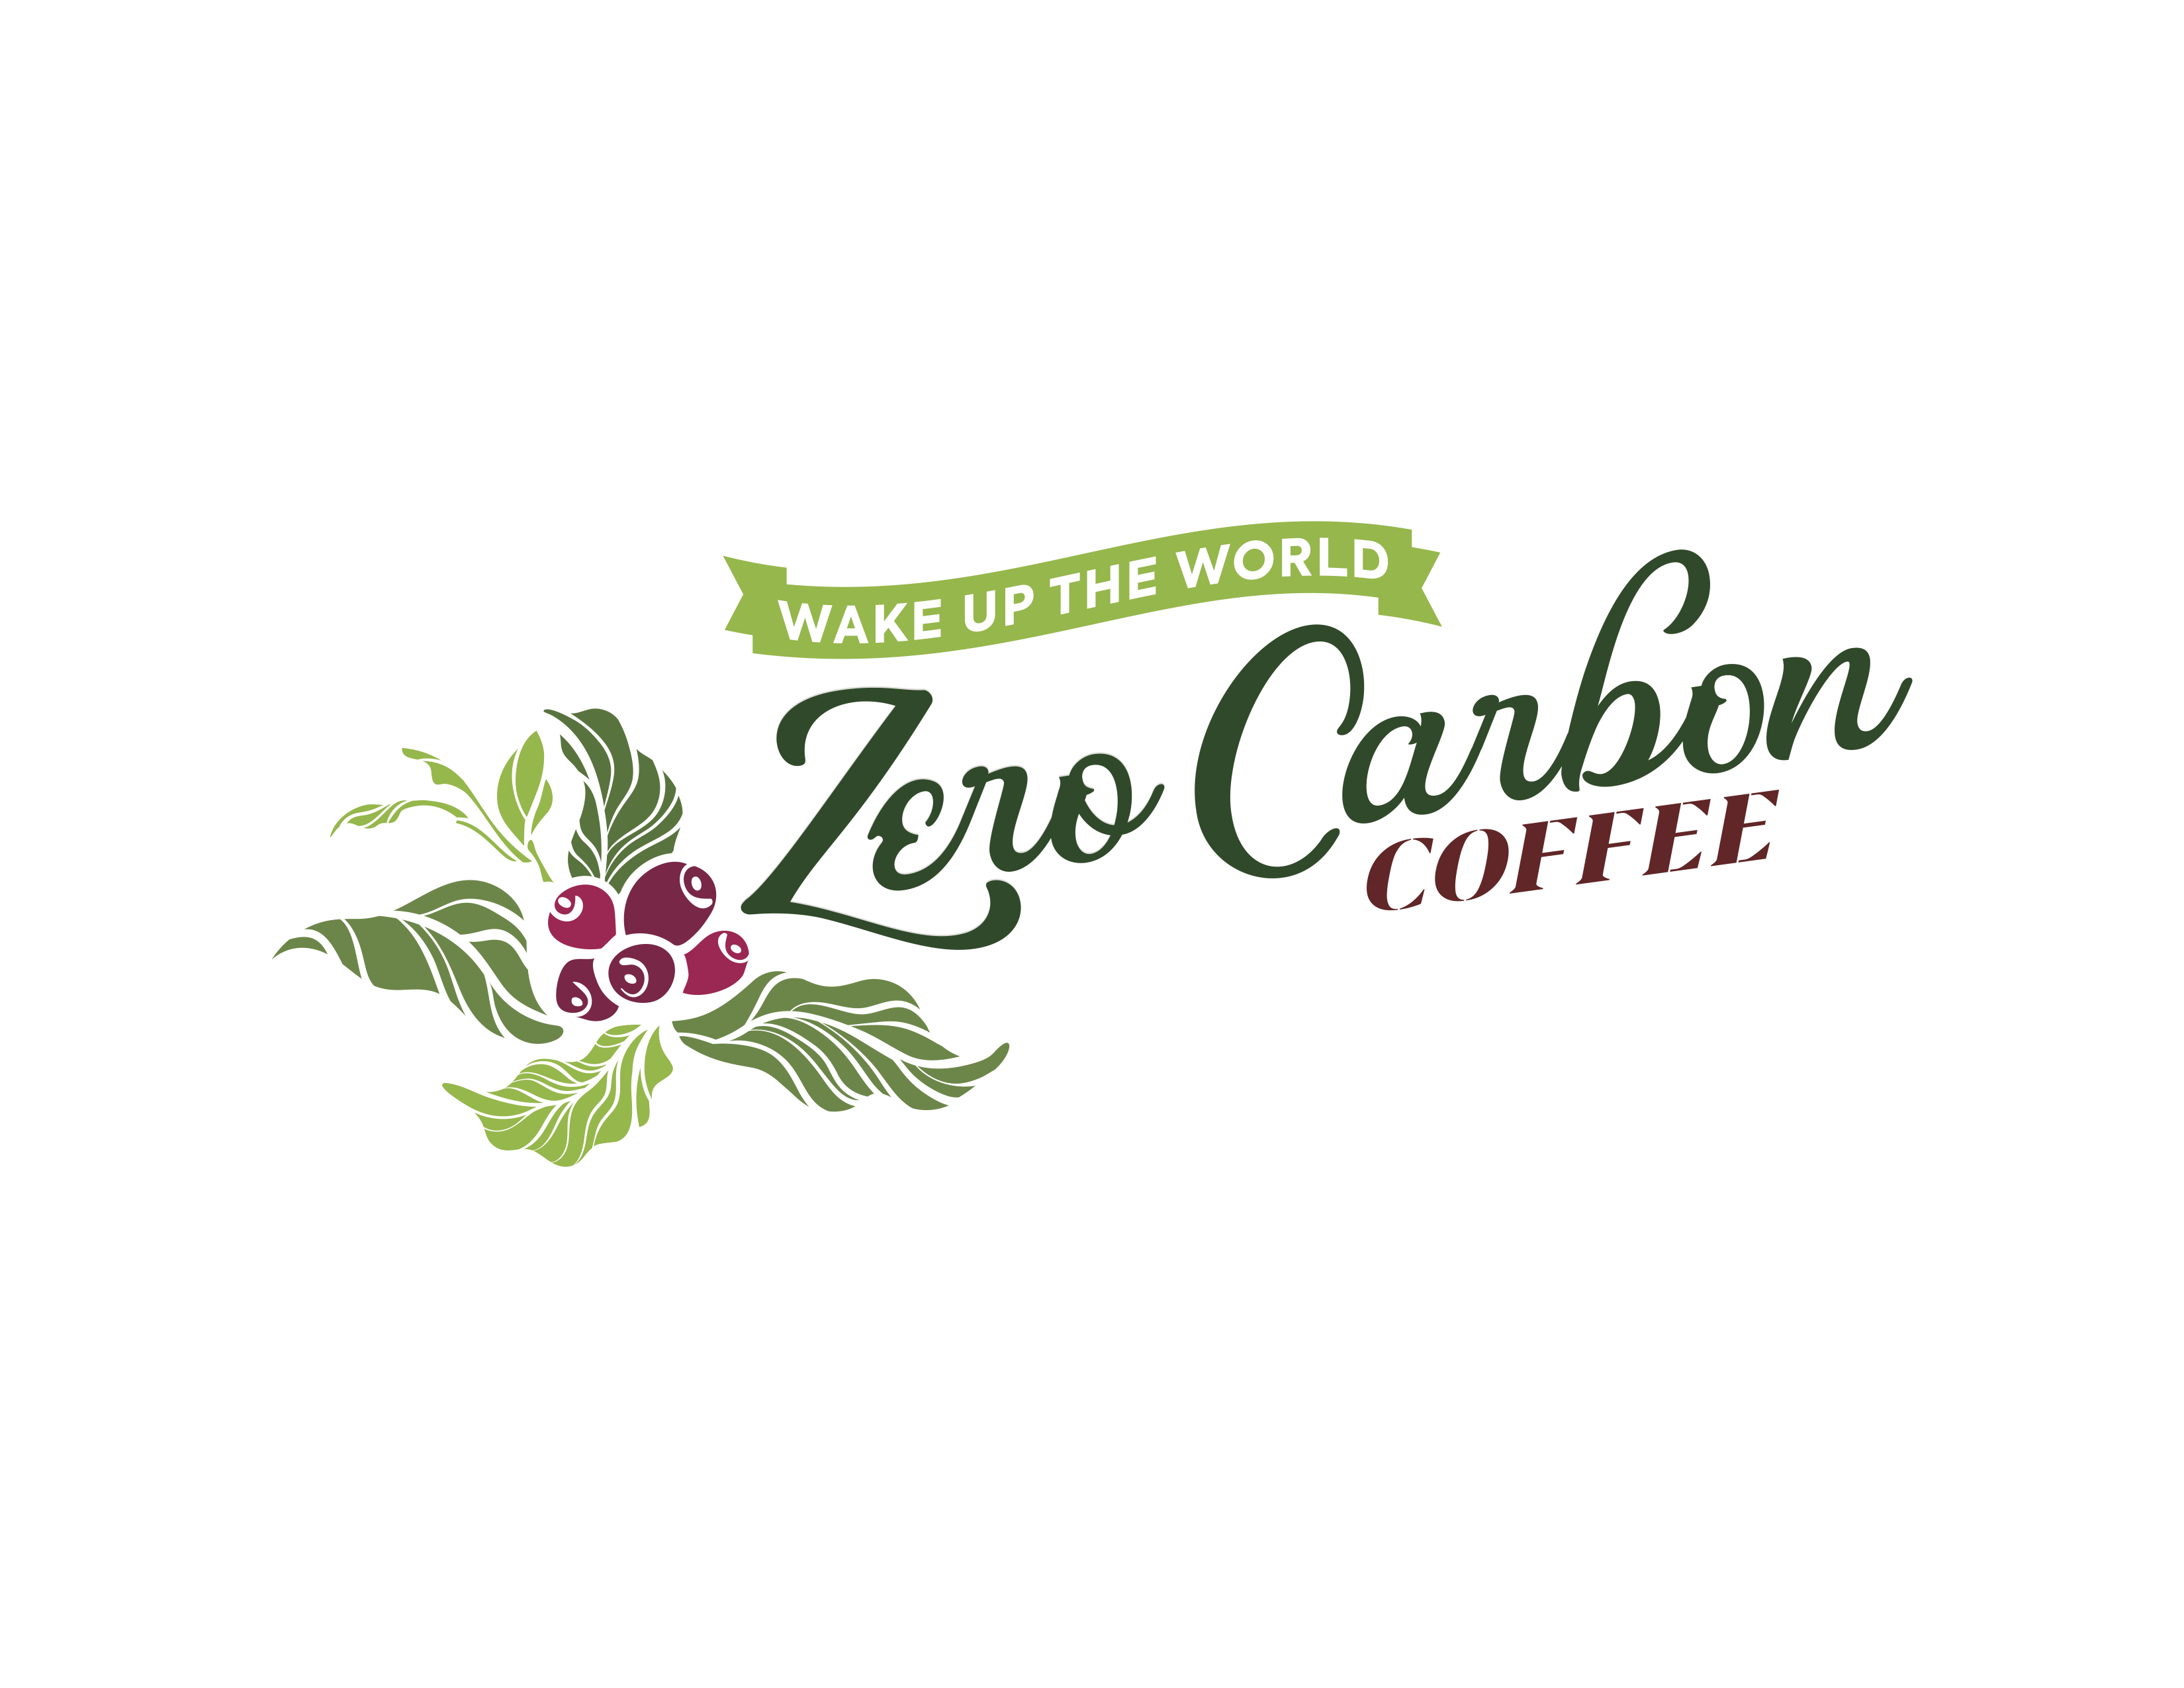 Zero Carbon Coffee